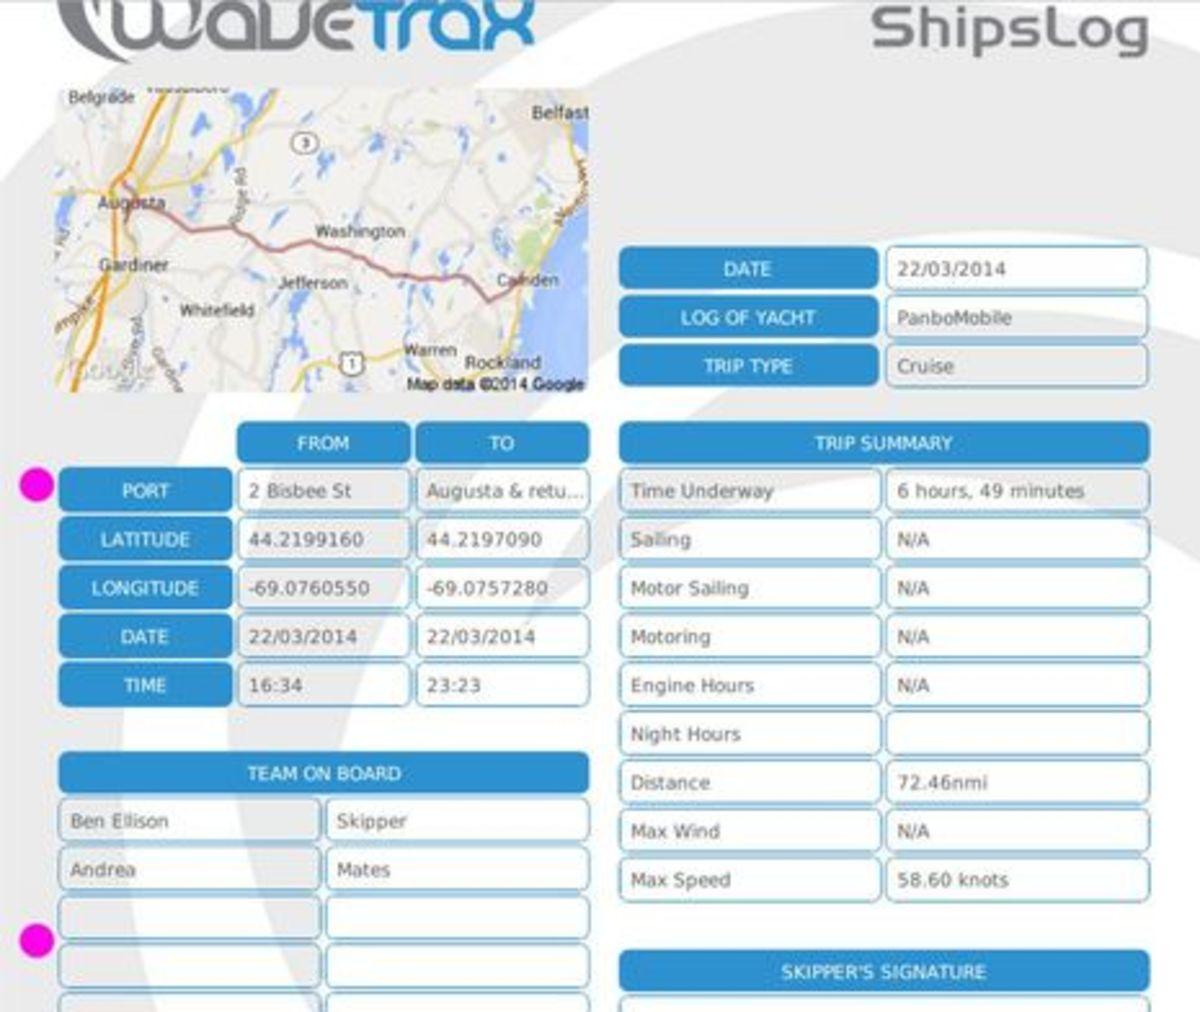 WaveTrax_test_log_PDF_cPanbo.jpg